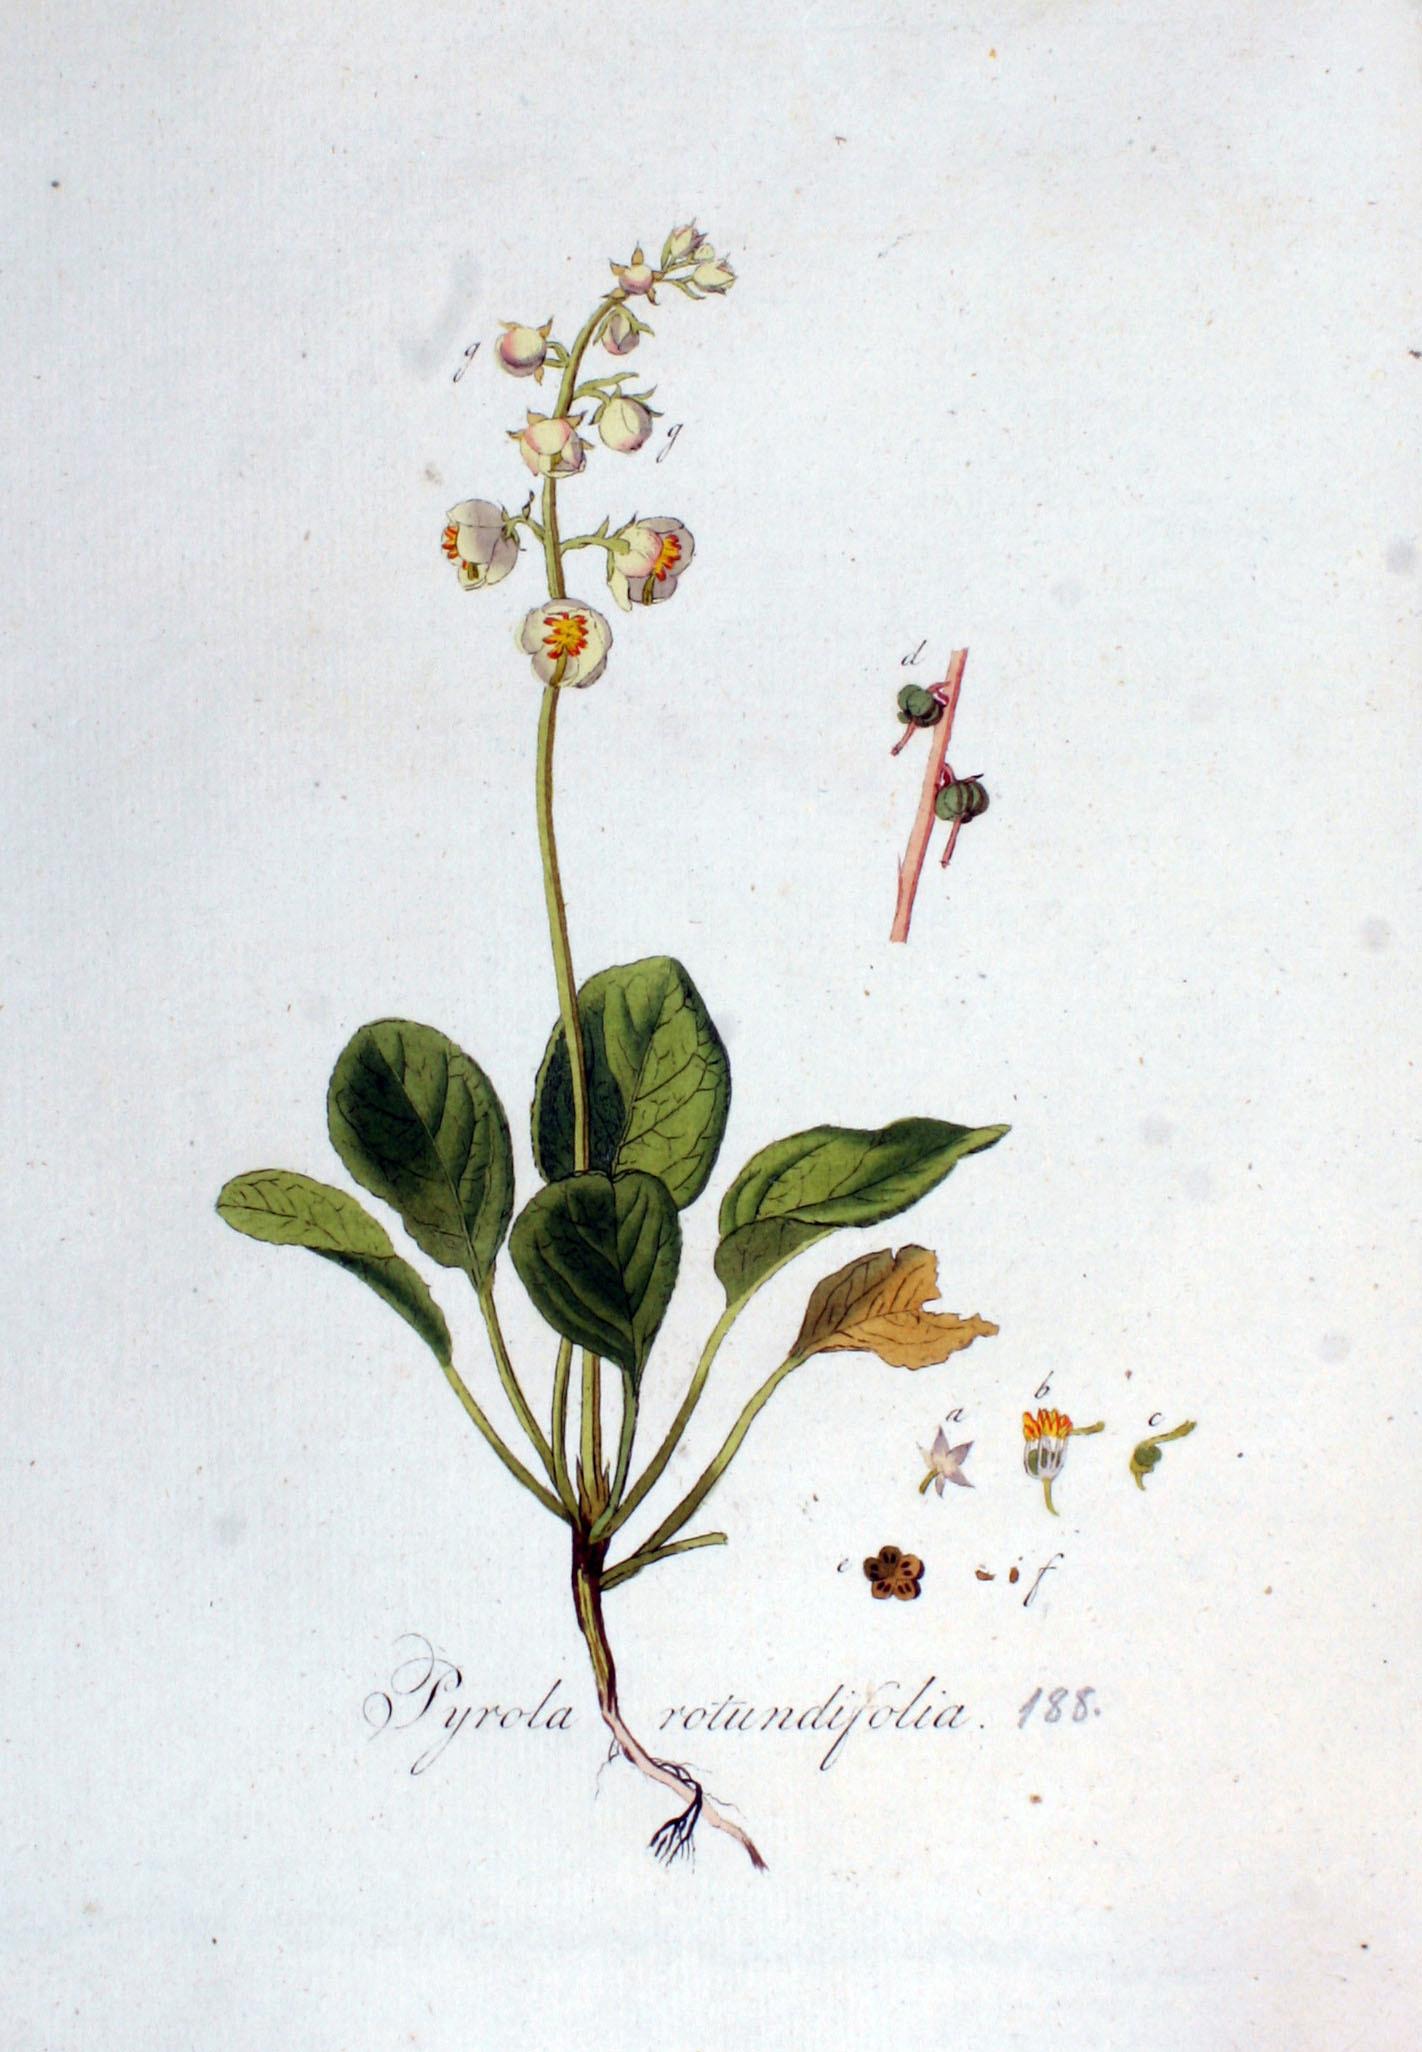 Plant-illustration-of-Round-leaved-wintergreen